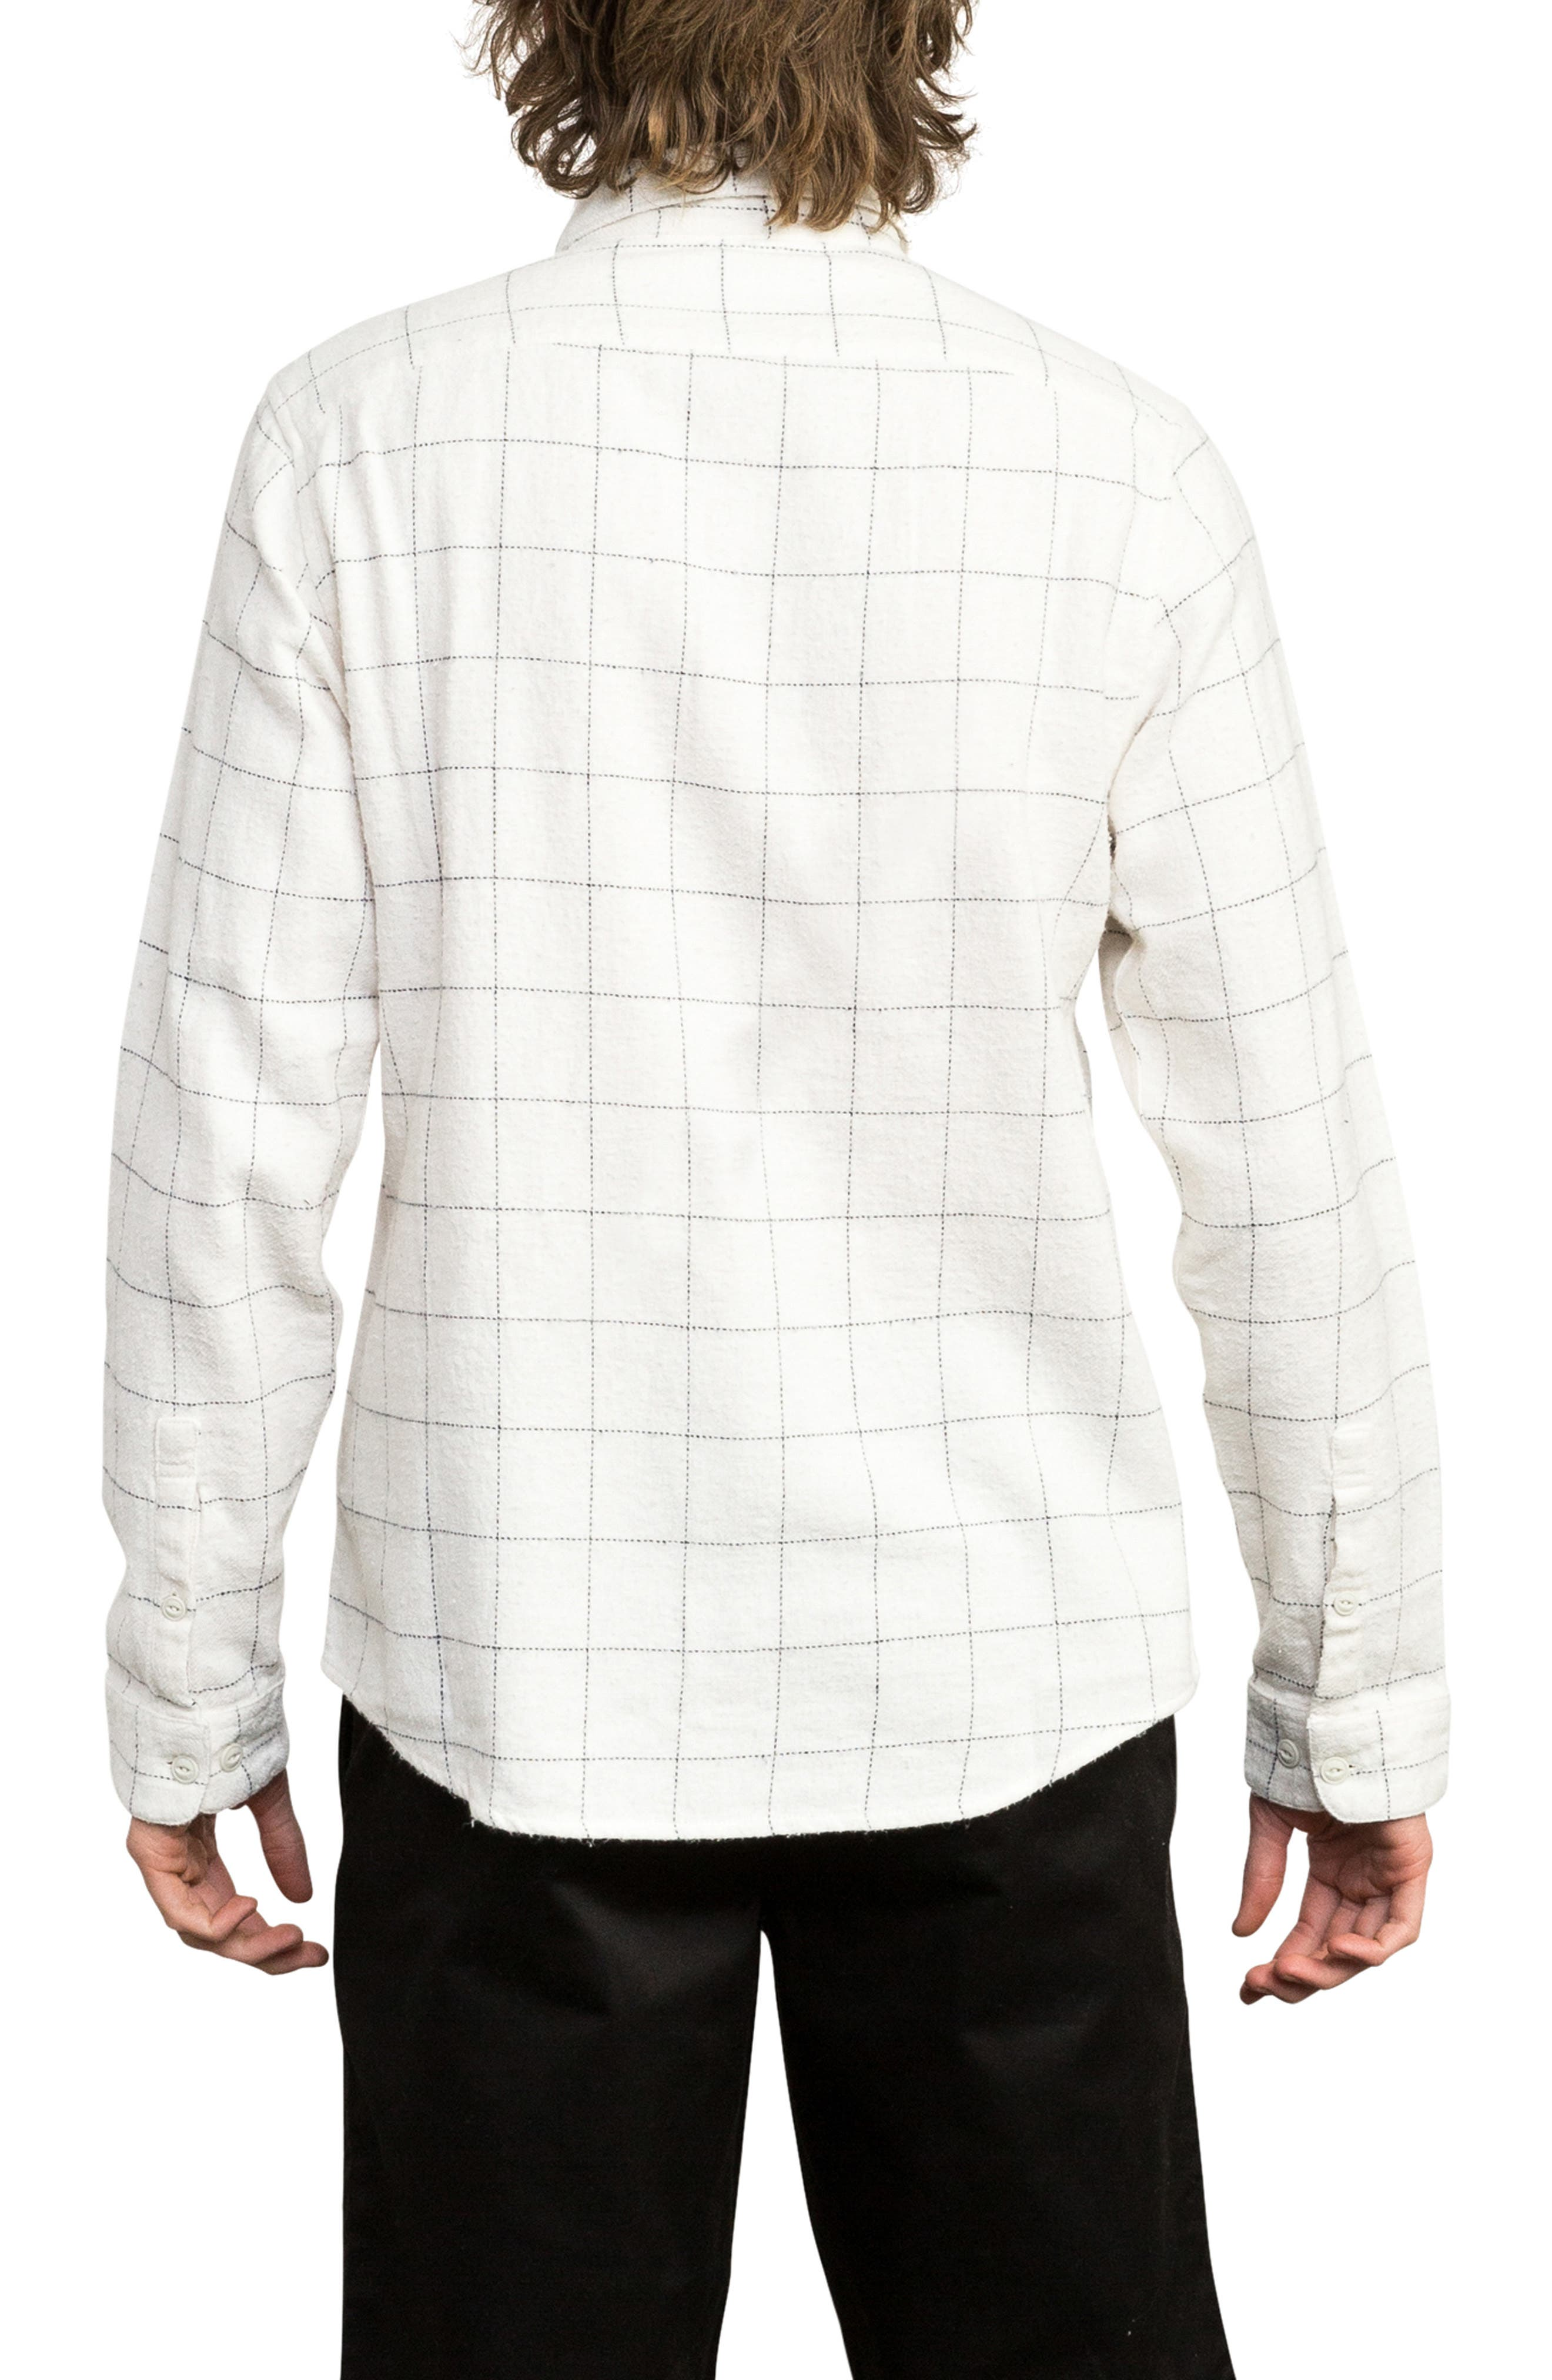 Arc Flannel Shirt,                             Alternate thumbnail 2, color,                             SILVER BLEACH